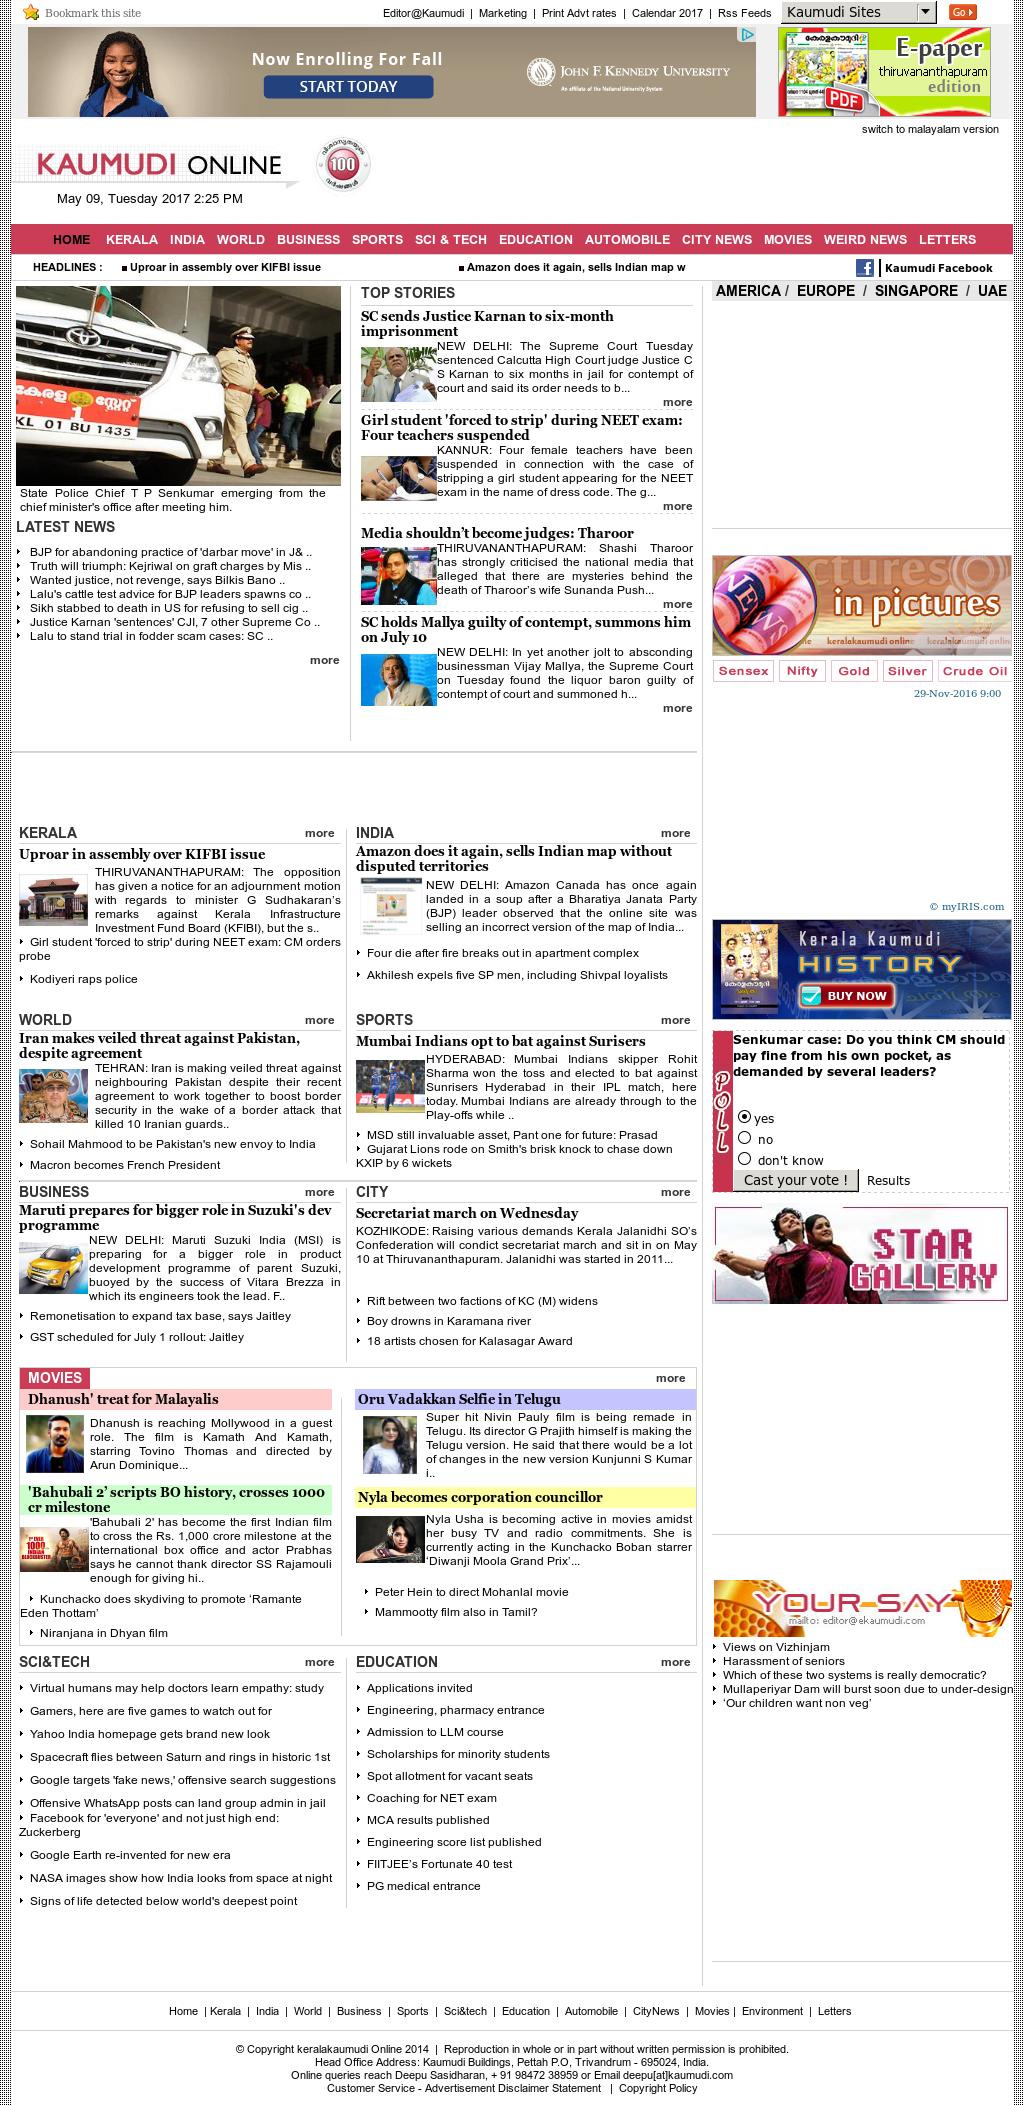 Keralakaumudi Competitors, Revenue and Employees - Owler